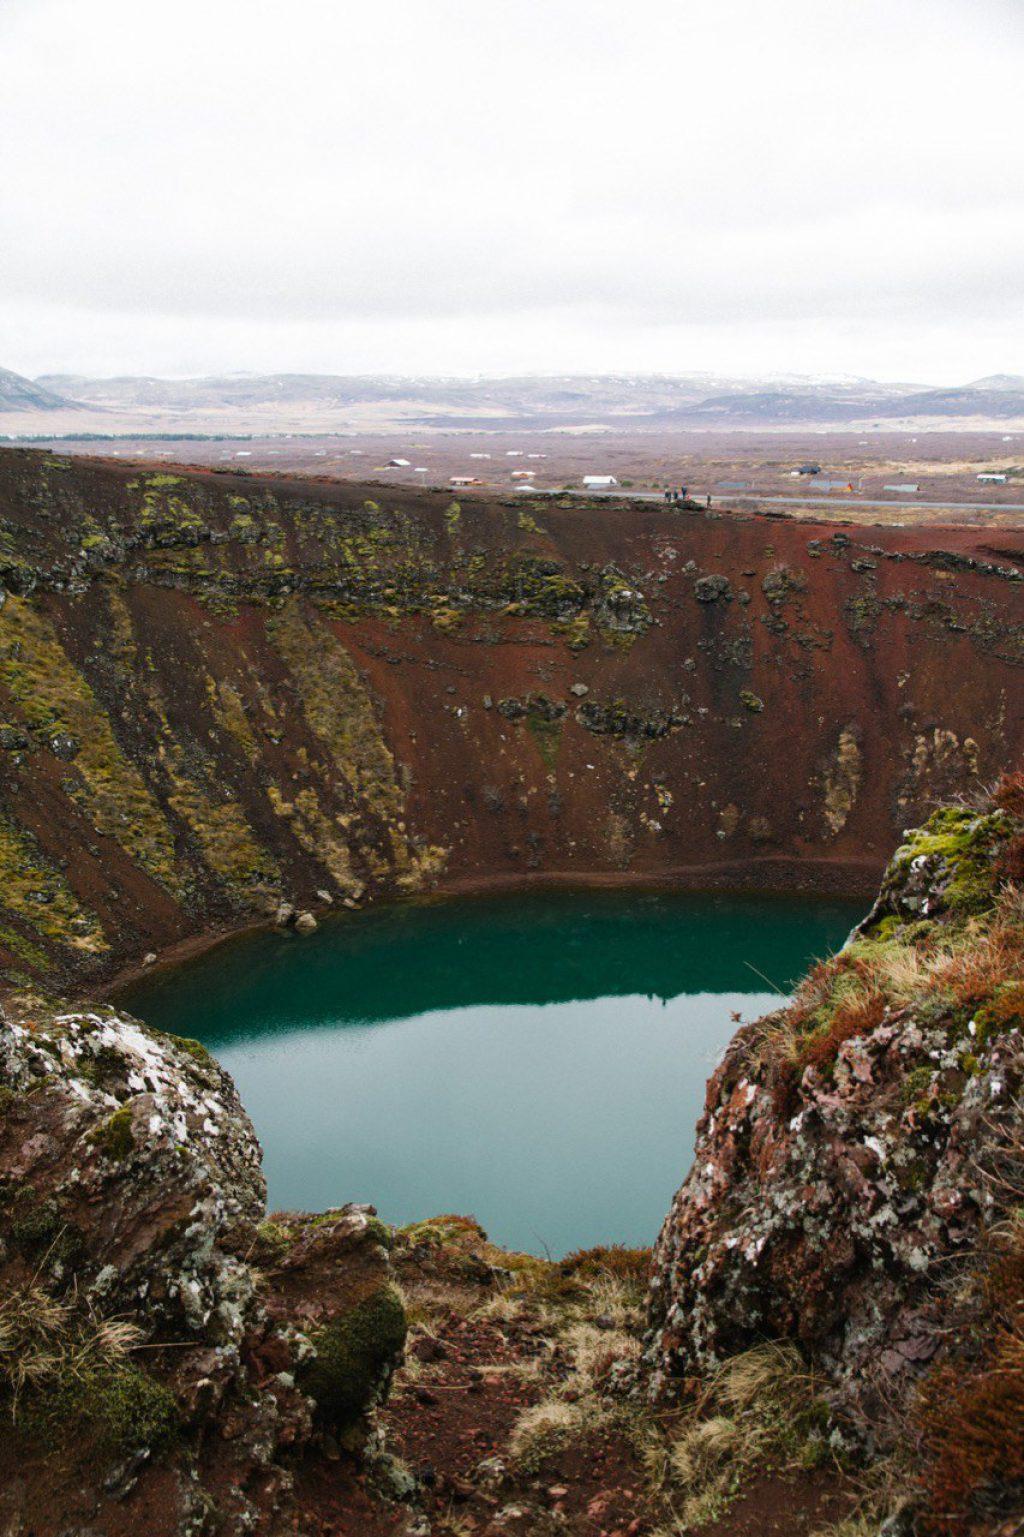 Iceland 2017 05 01 01 12 41